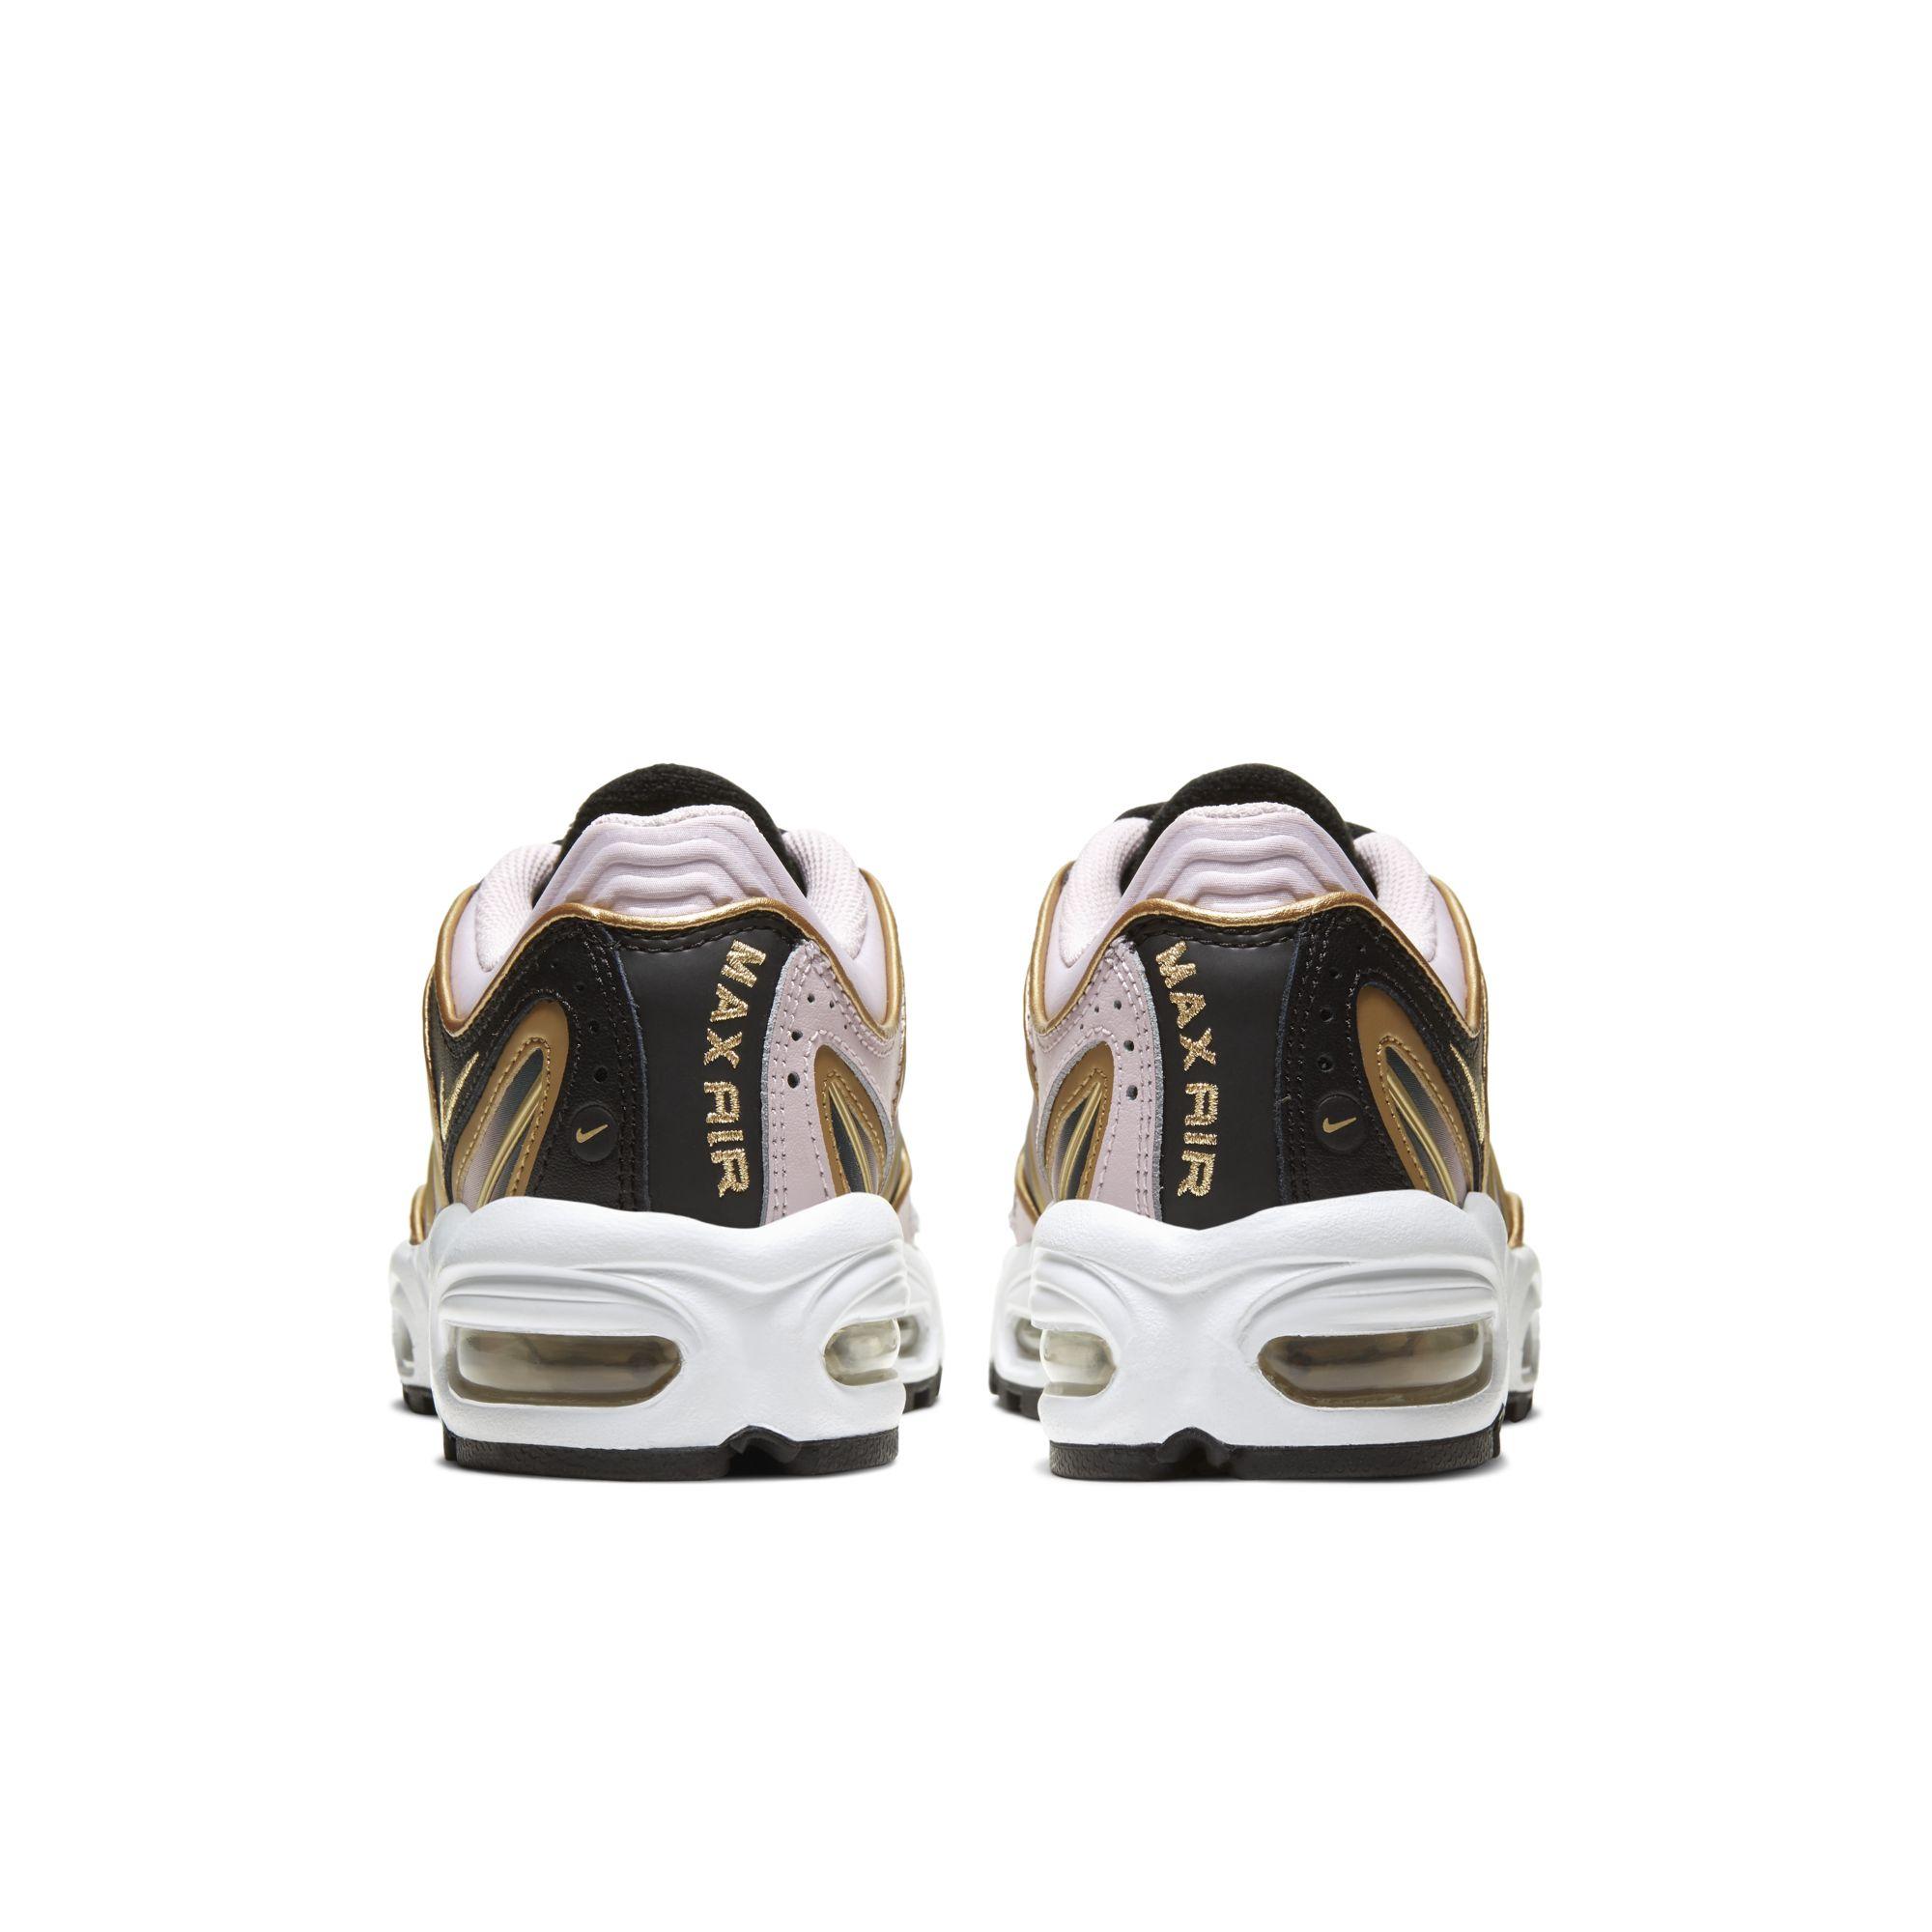 Nike,Air Max Tailwind 4  黑金主题点缀淡淡粉色!这双 Air Max Tailwind 4 你打几分?